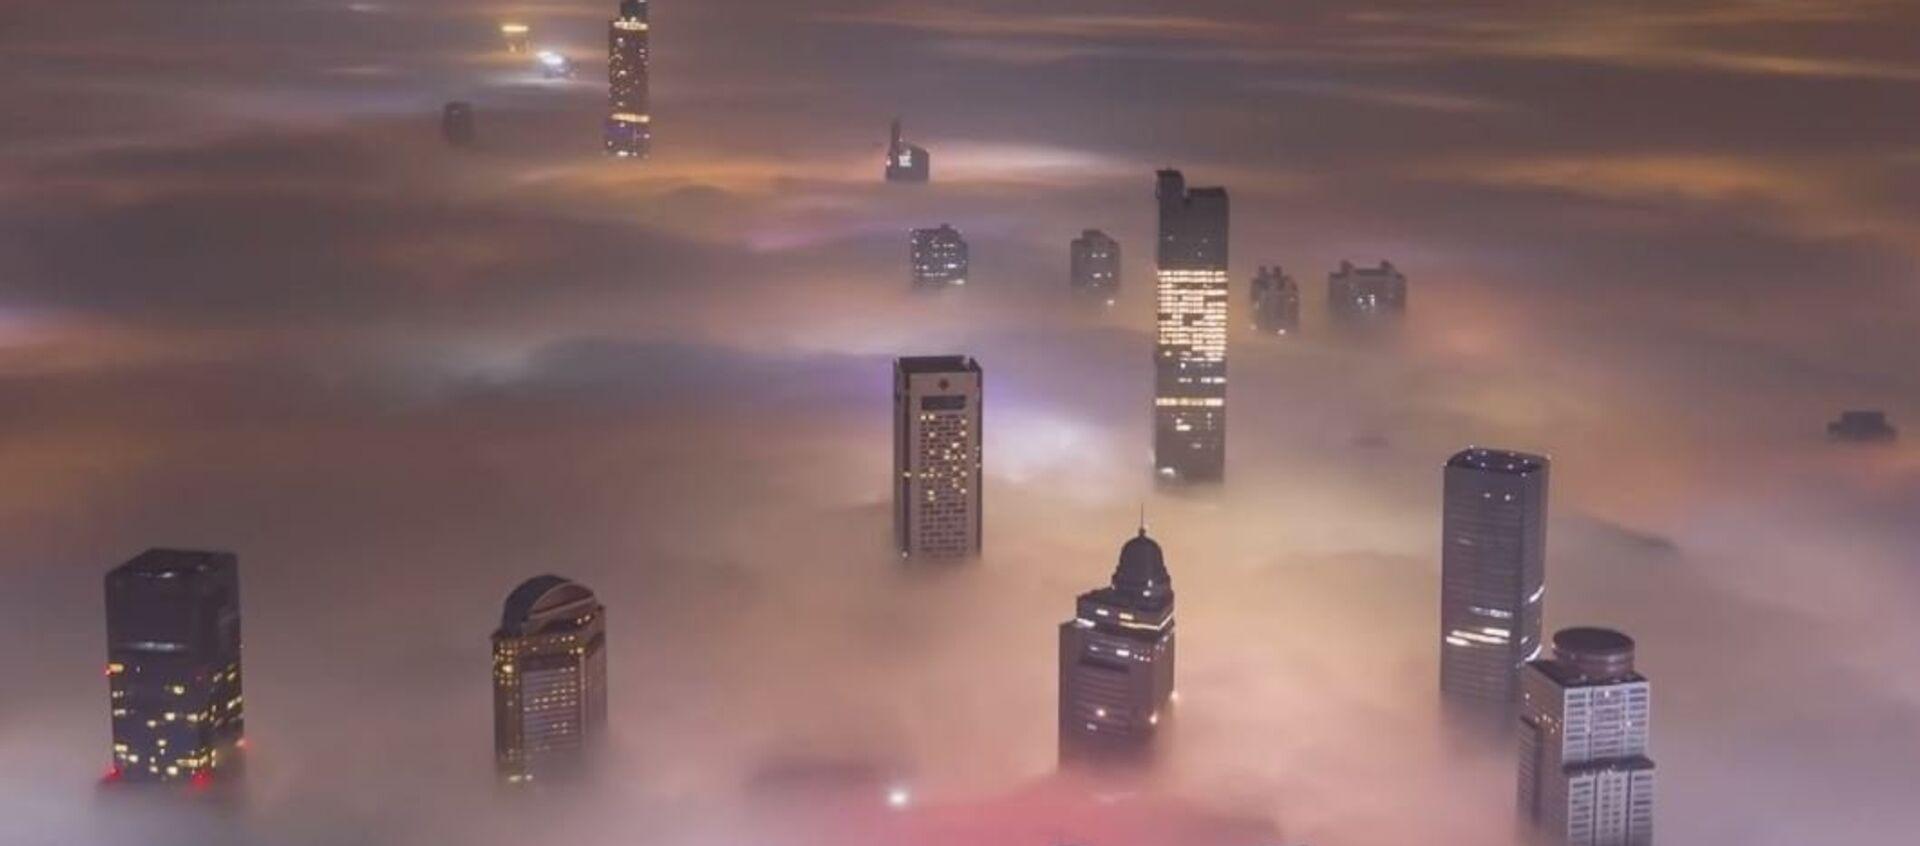 La niebla 'se traga' una ciudad china - Sputnik Mundo, 1920, 30.11.2018